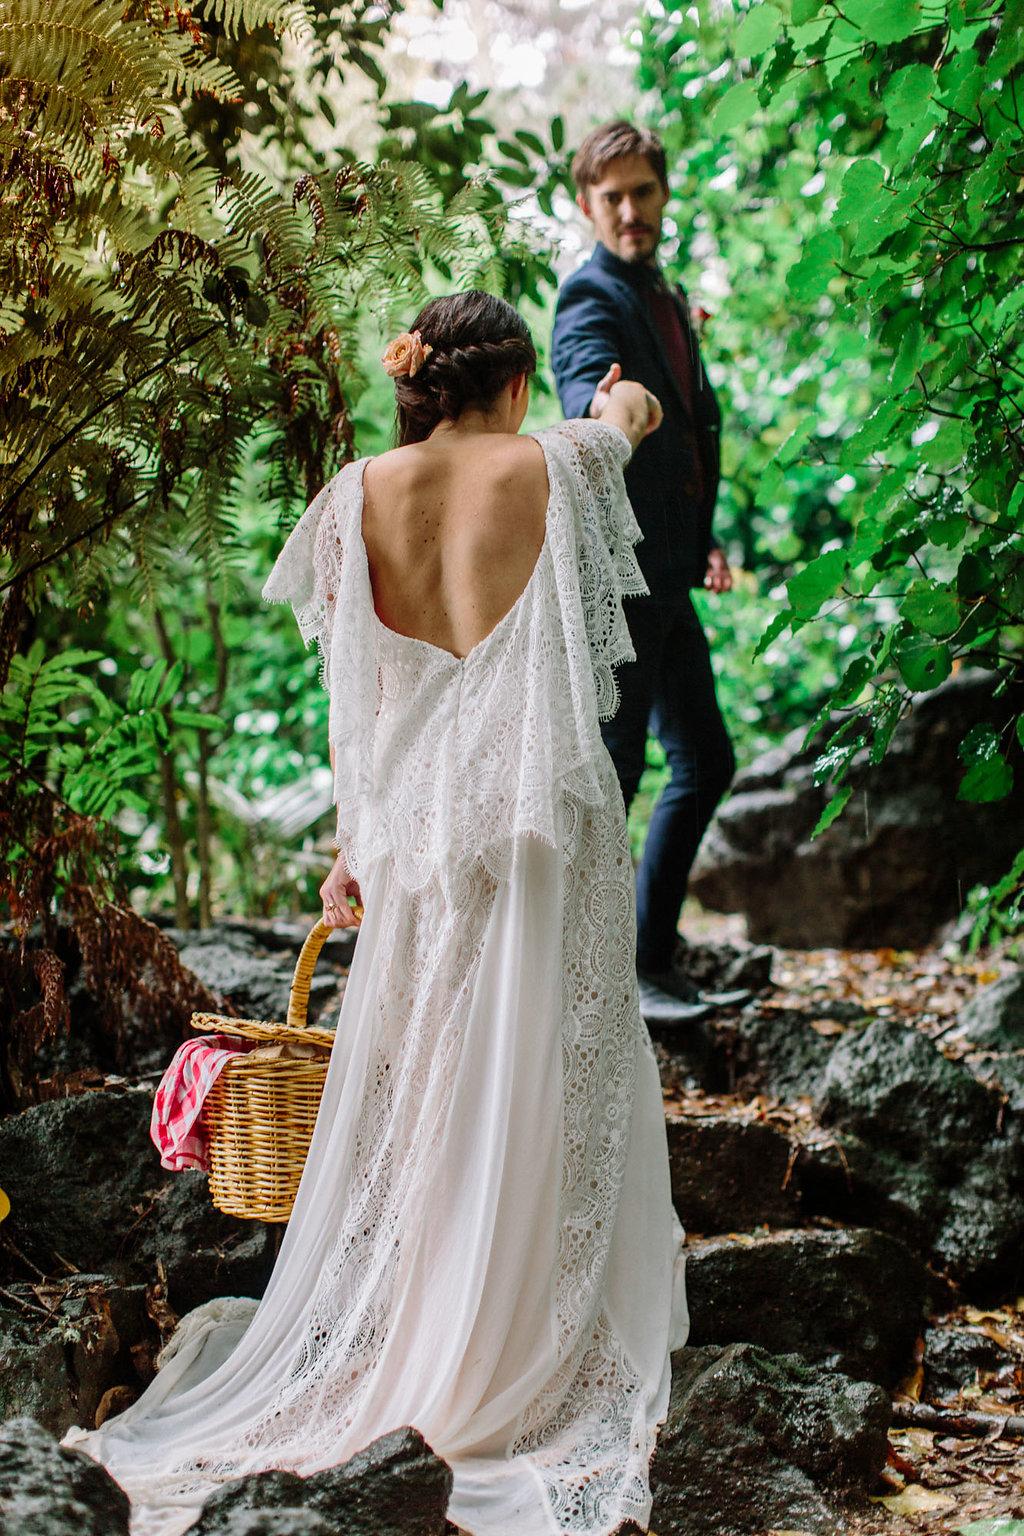 elizabeth may bridal littleredlow-105.jpg